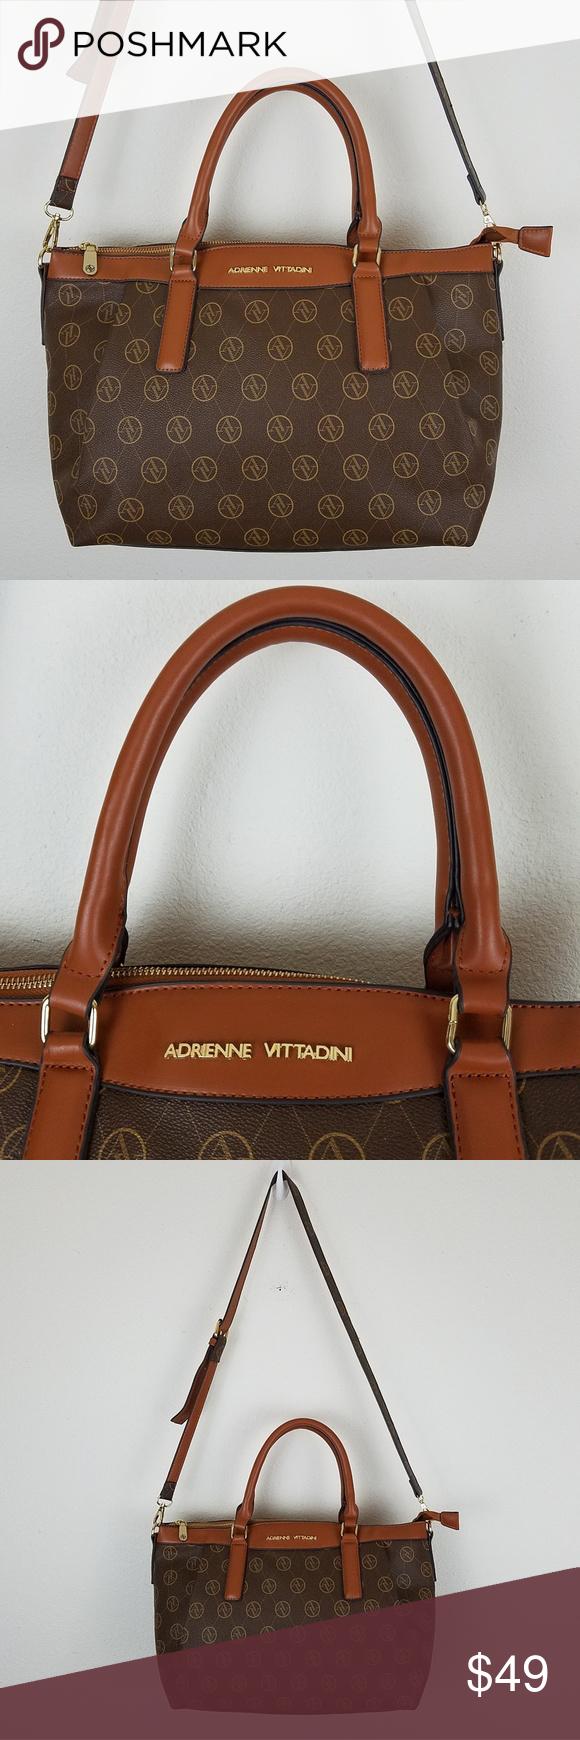 NWOT Adrienne Vittadini Shoulder Bag Adrienne Vittadini Shoulder ...